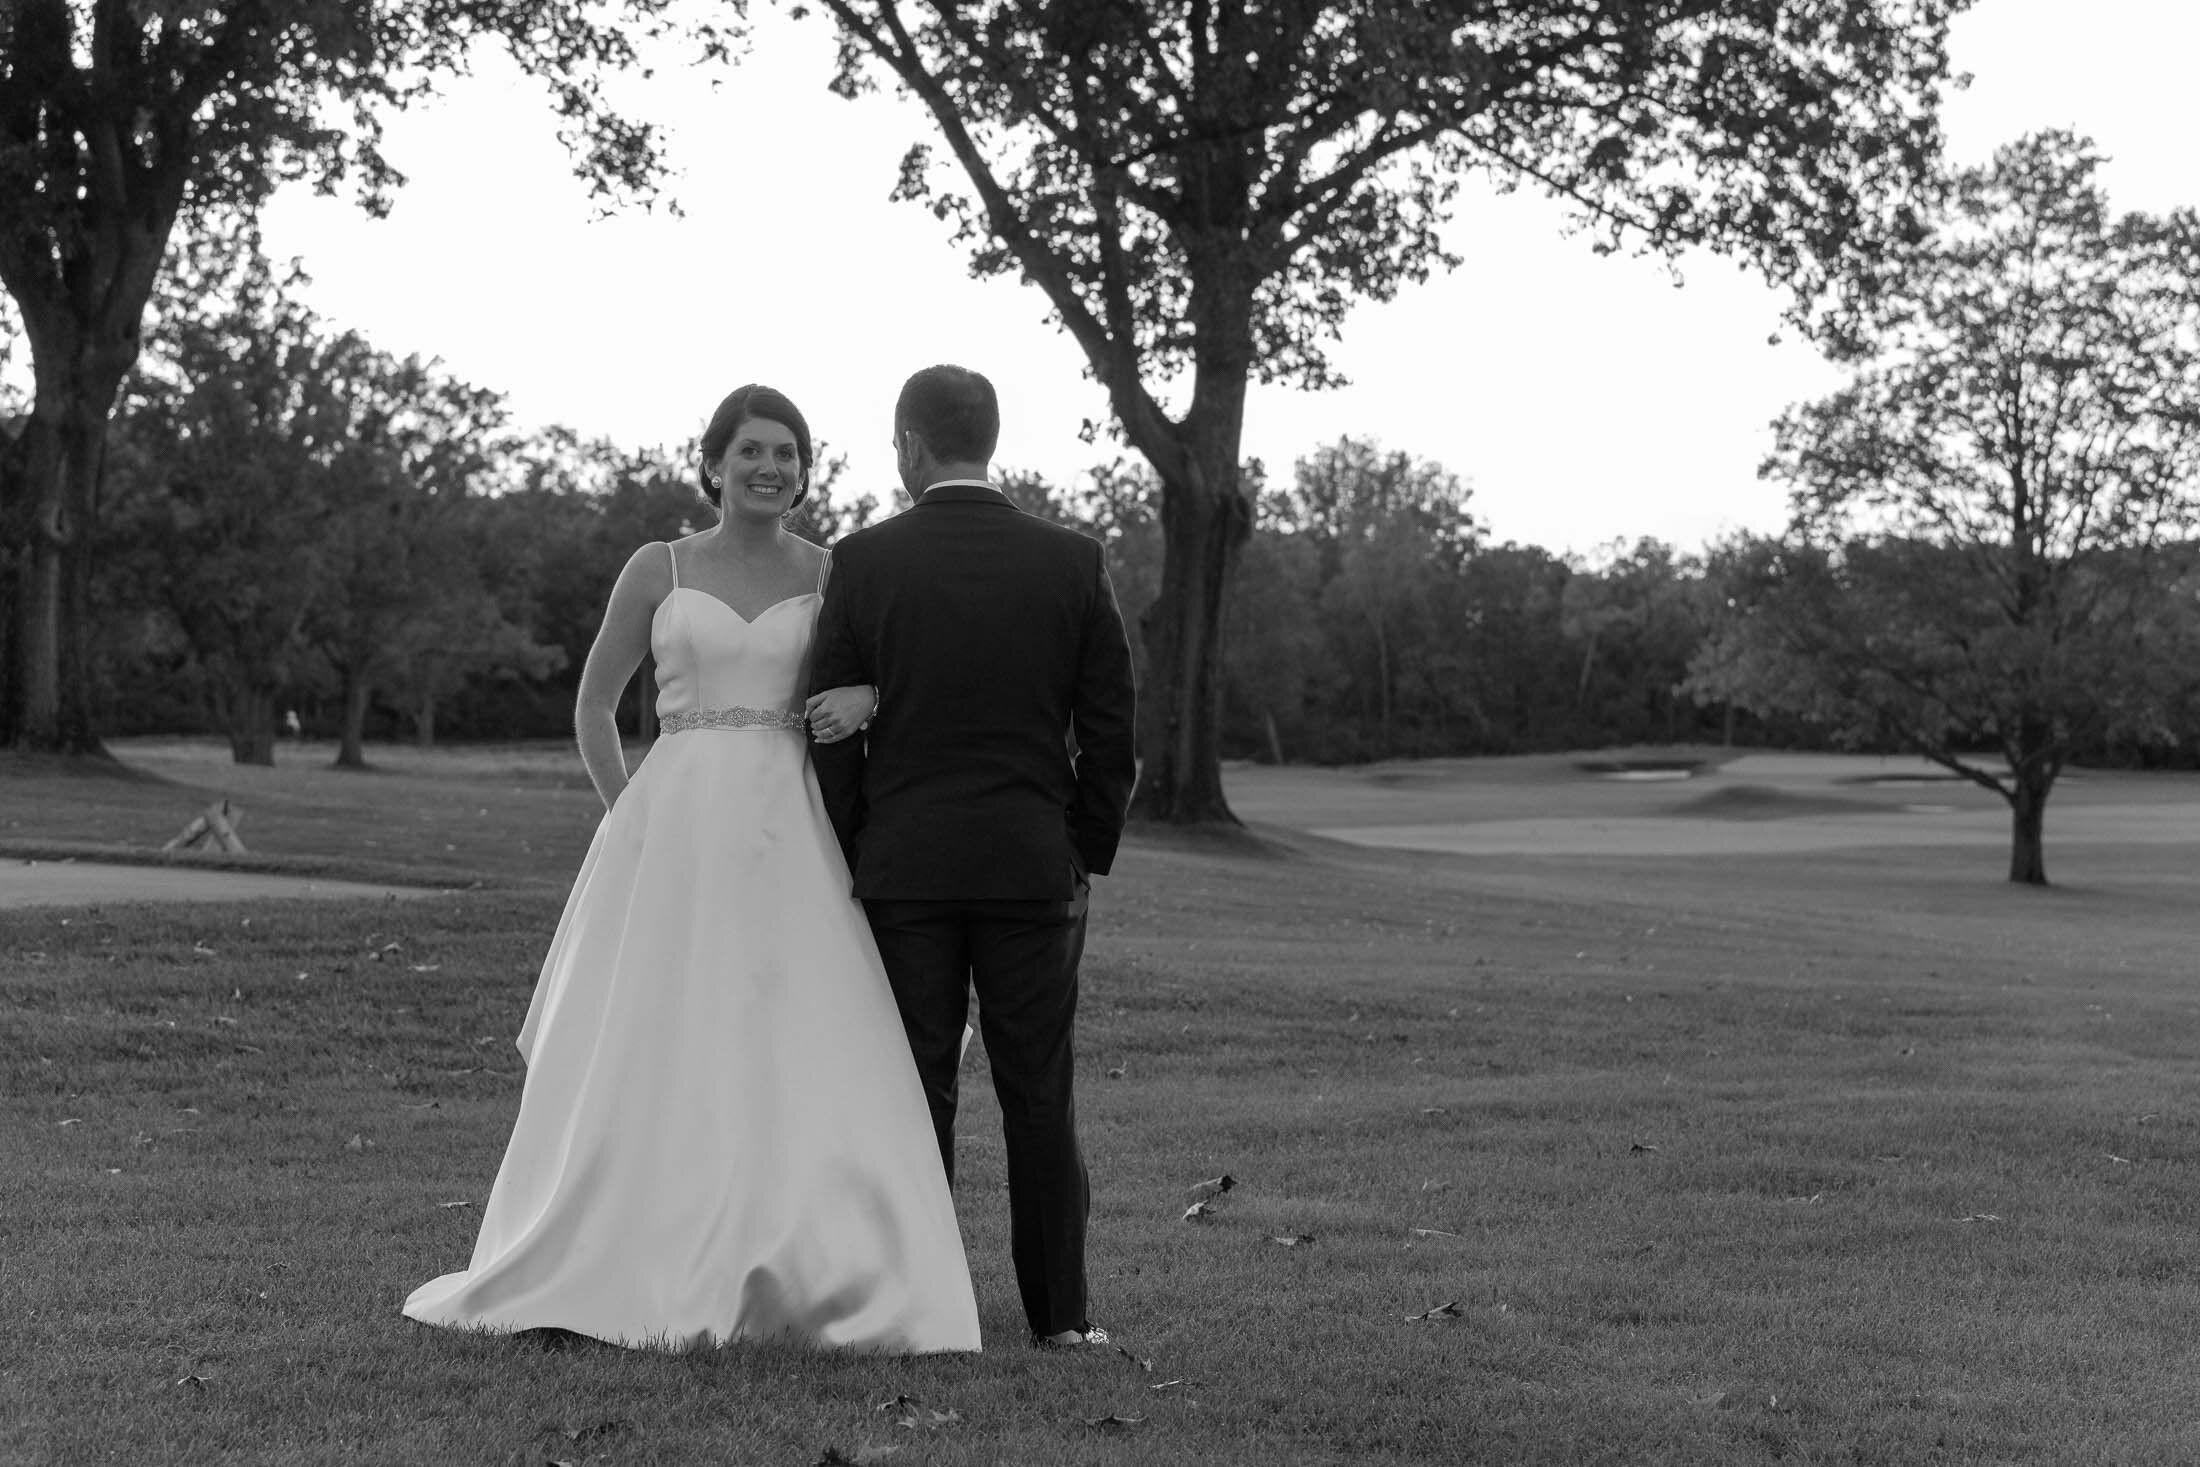 Moraine Country Club Wedding Dayton Ohio Cincinnati Wedding Venues Dayton Wedding Venues Cincinnati Weddings